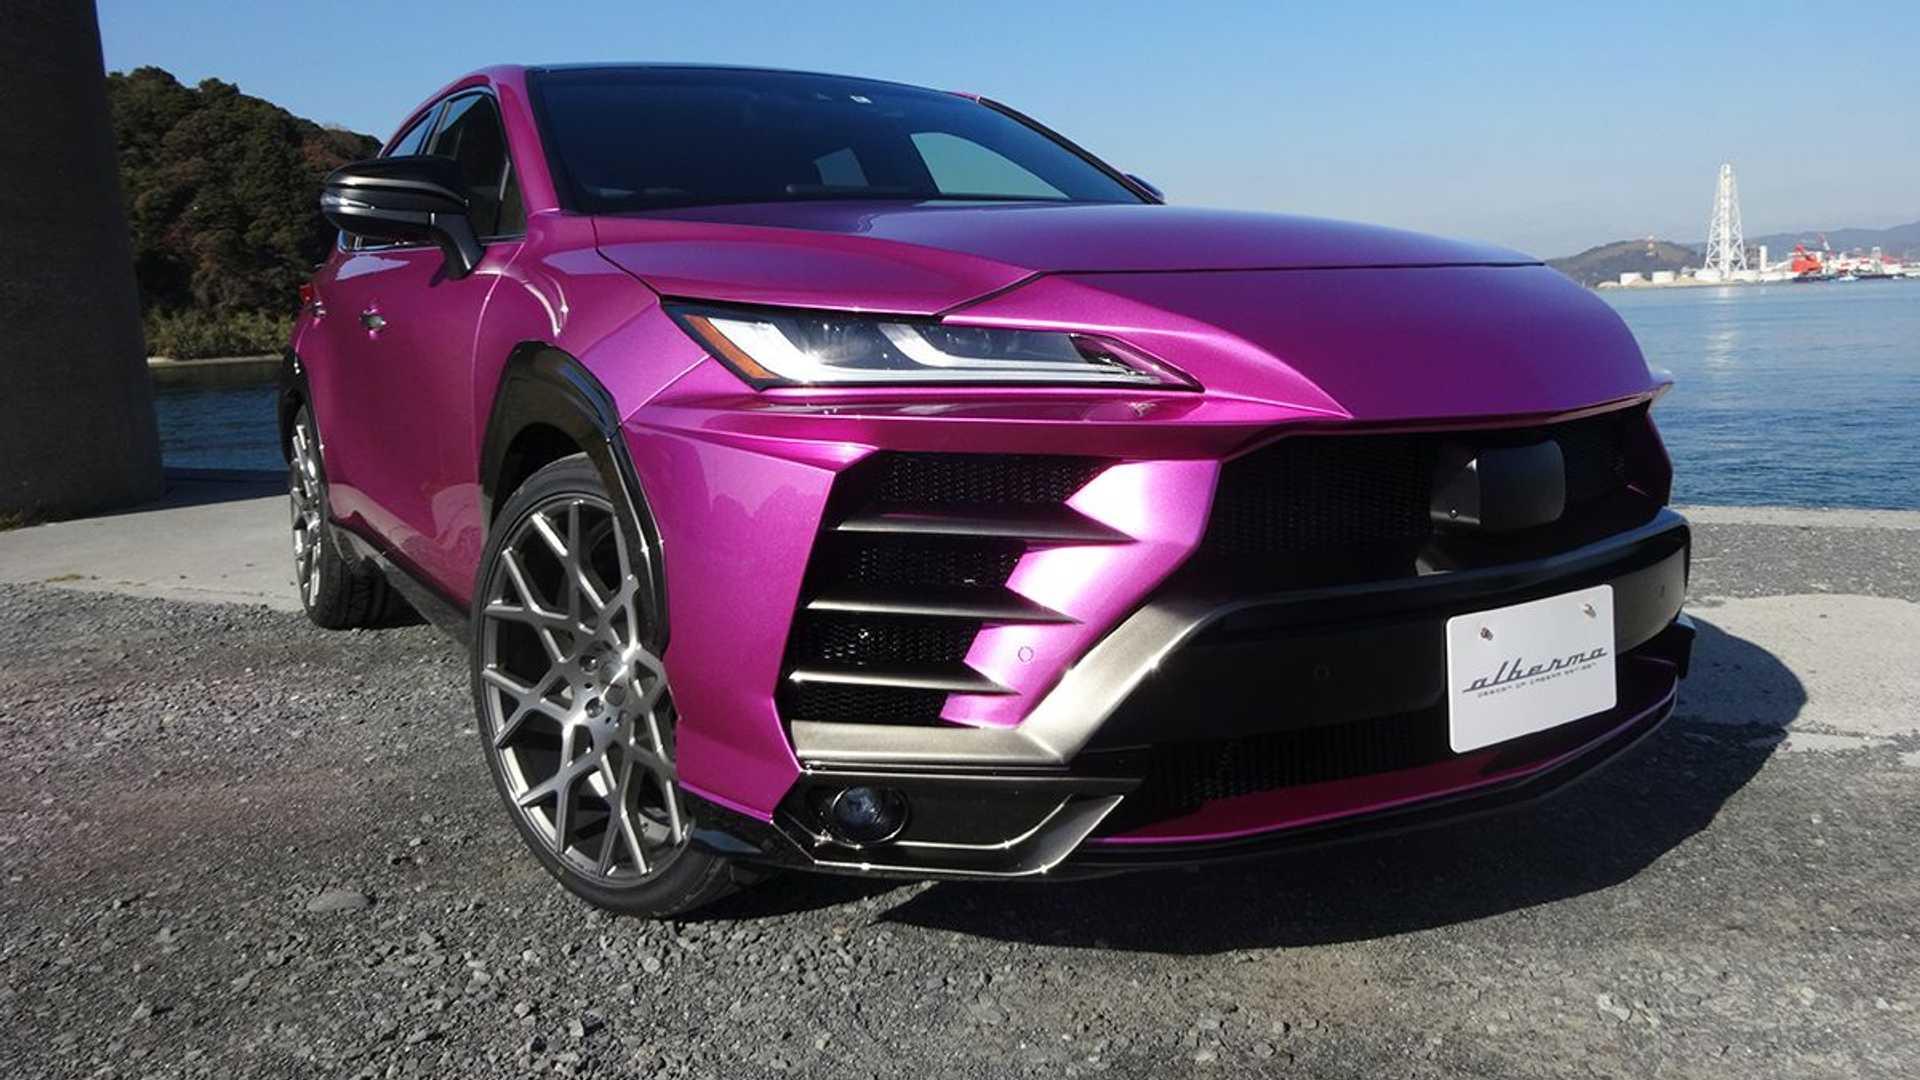 Toyota-Venza-bodykit-By-Albermo-1